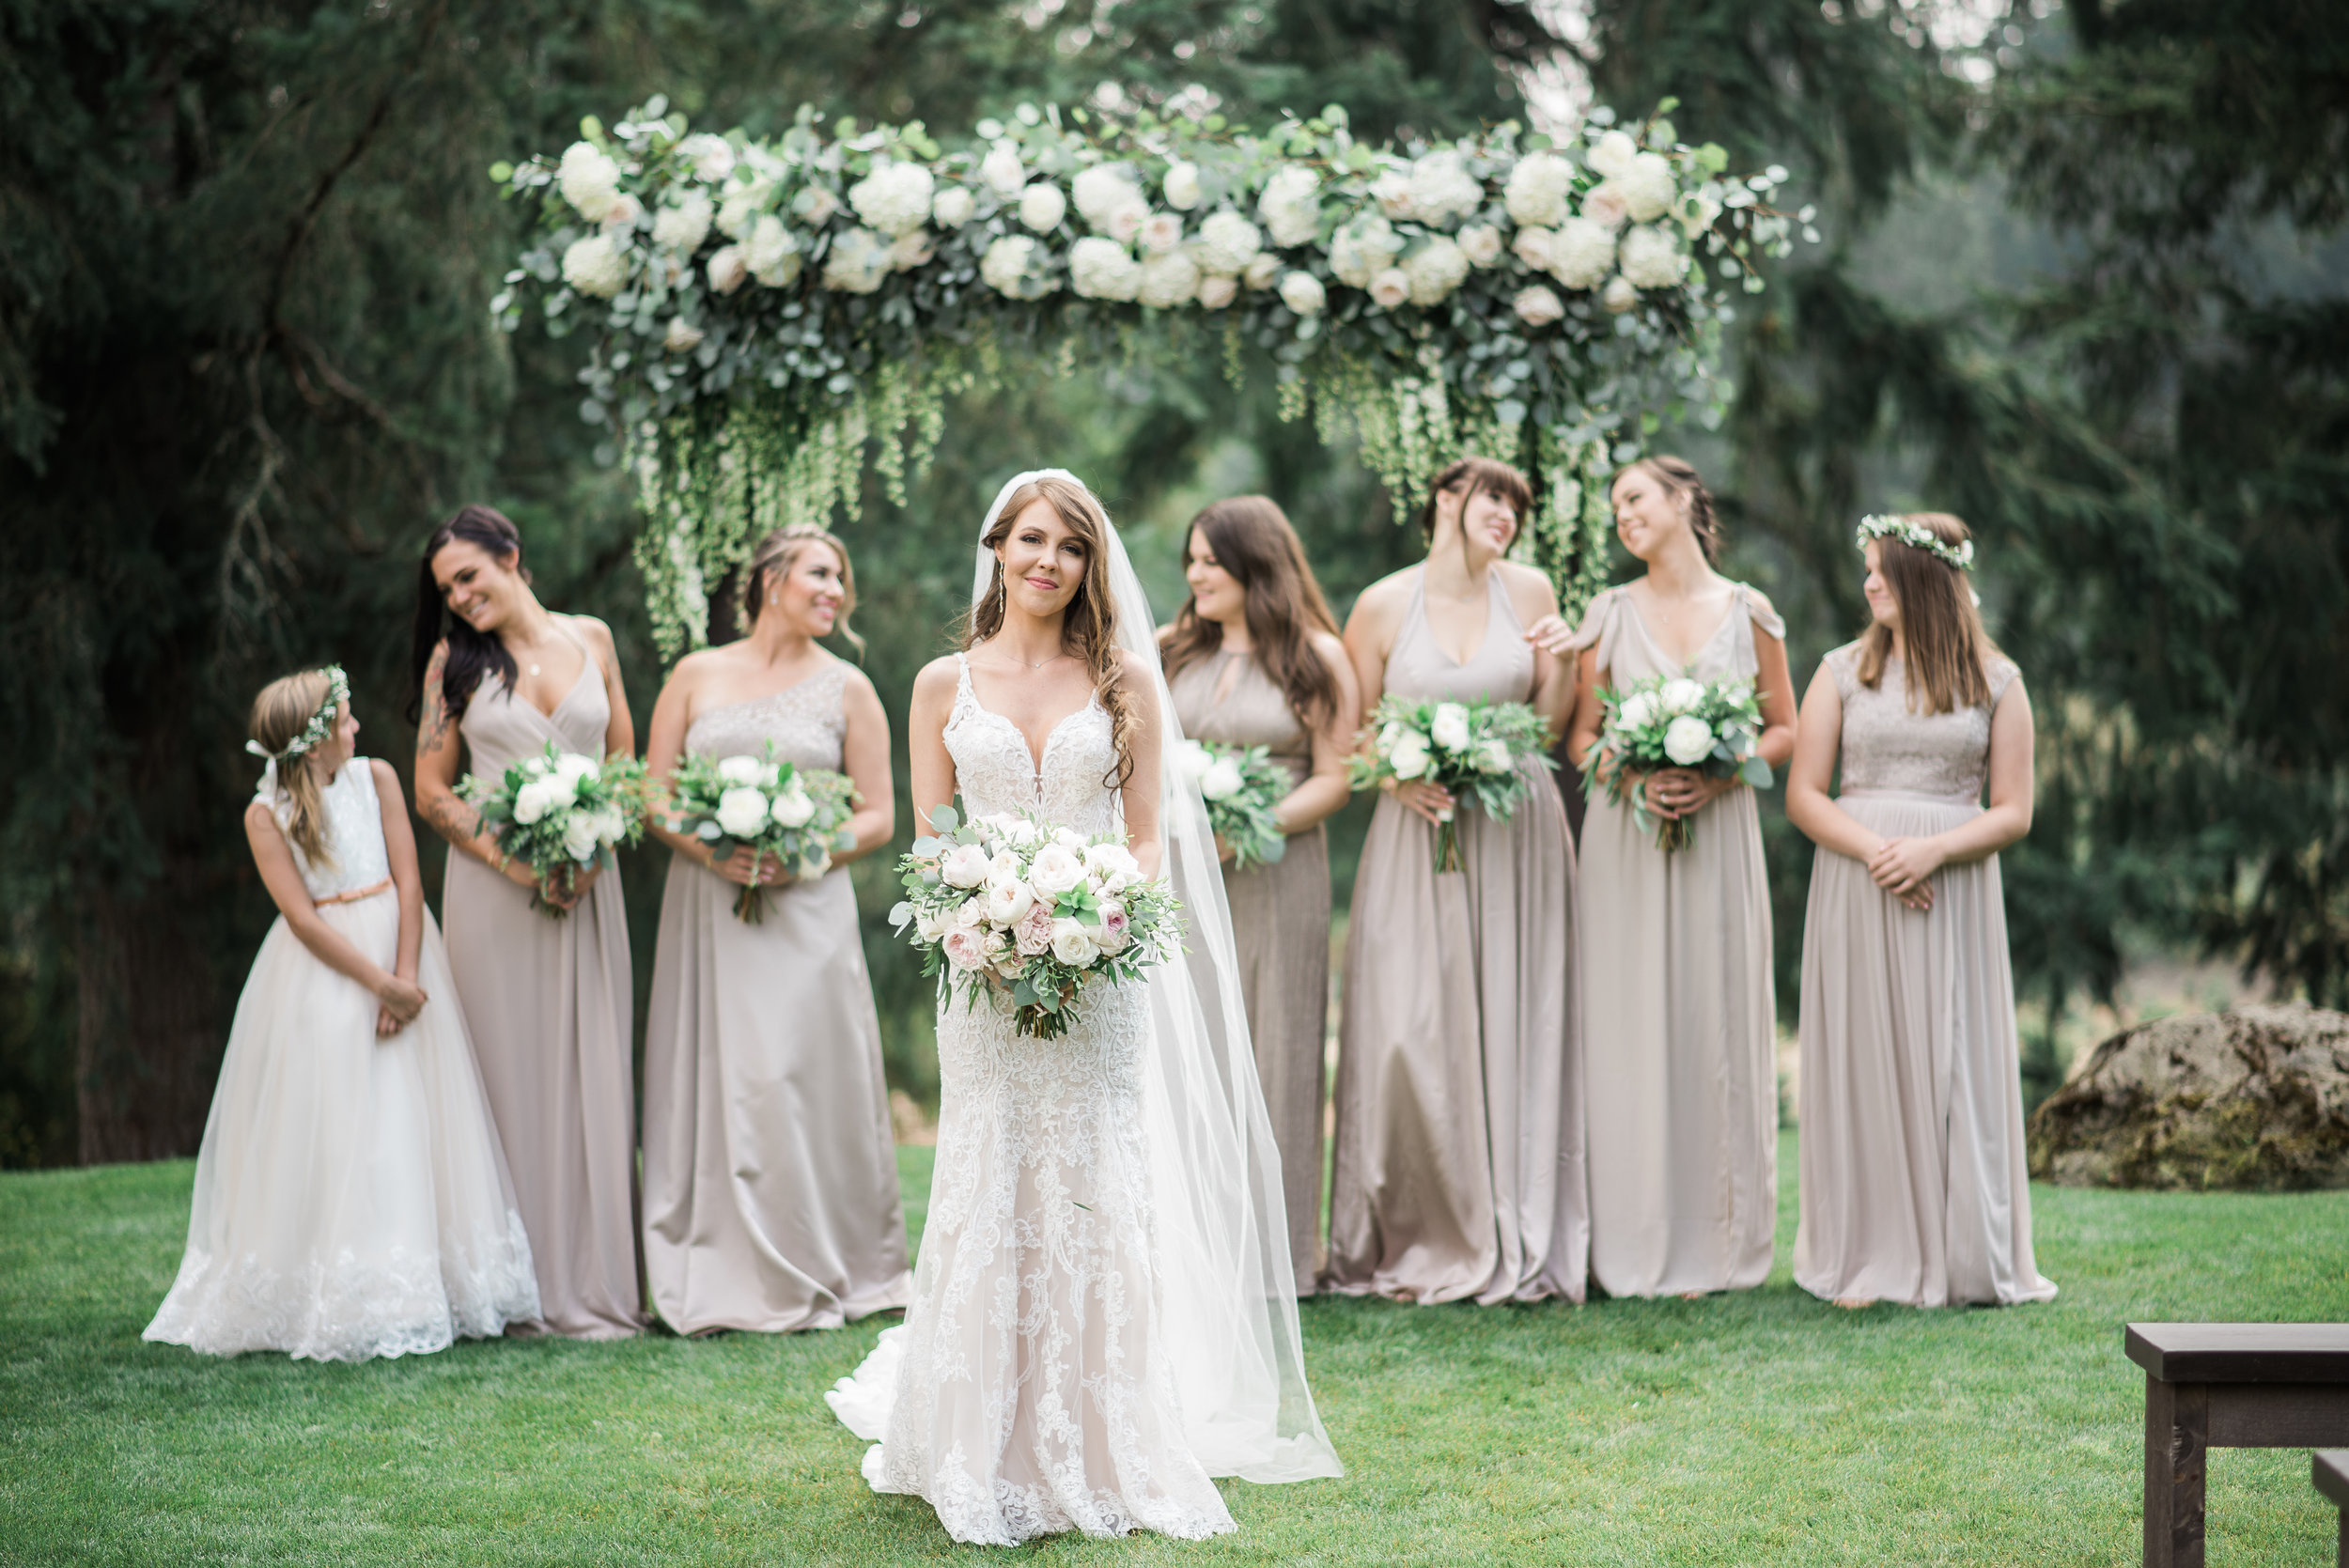 Trinity Tree Farm Wedding. Flowers from Bloom by Tara